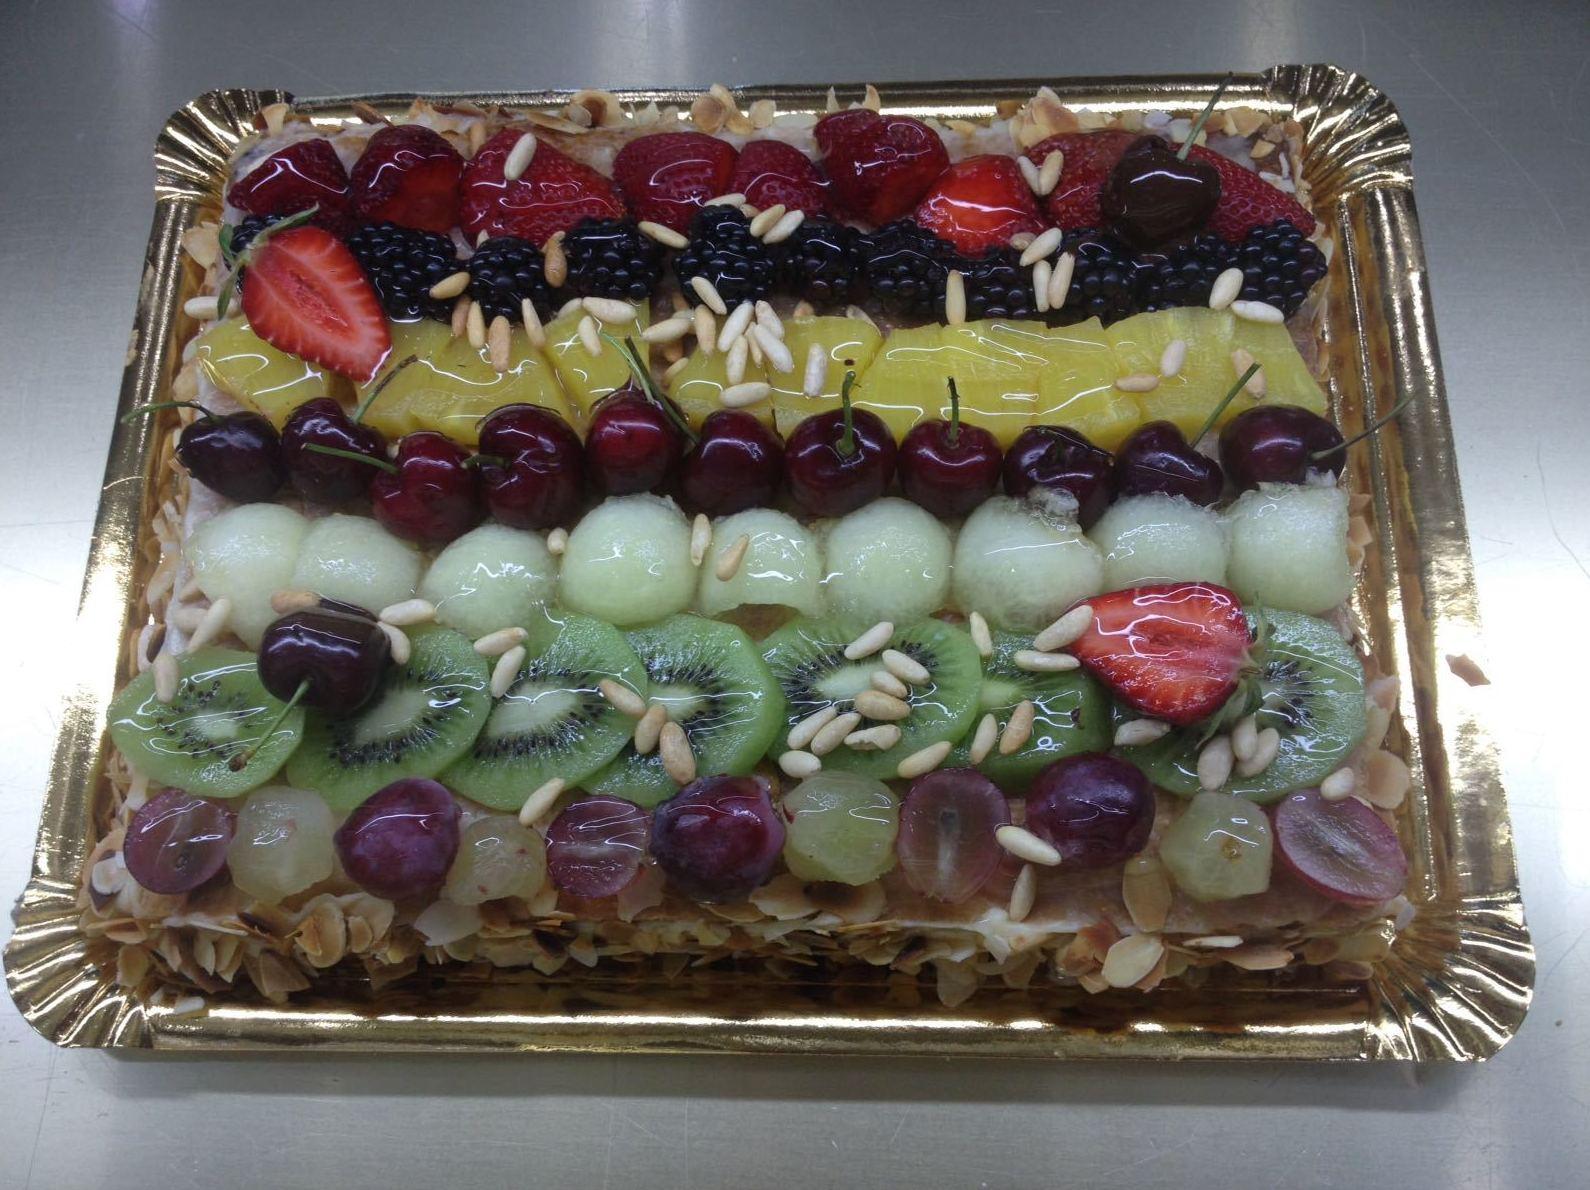 Tarta de frutas en Madrid